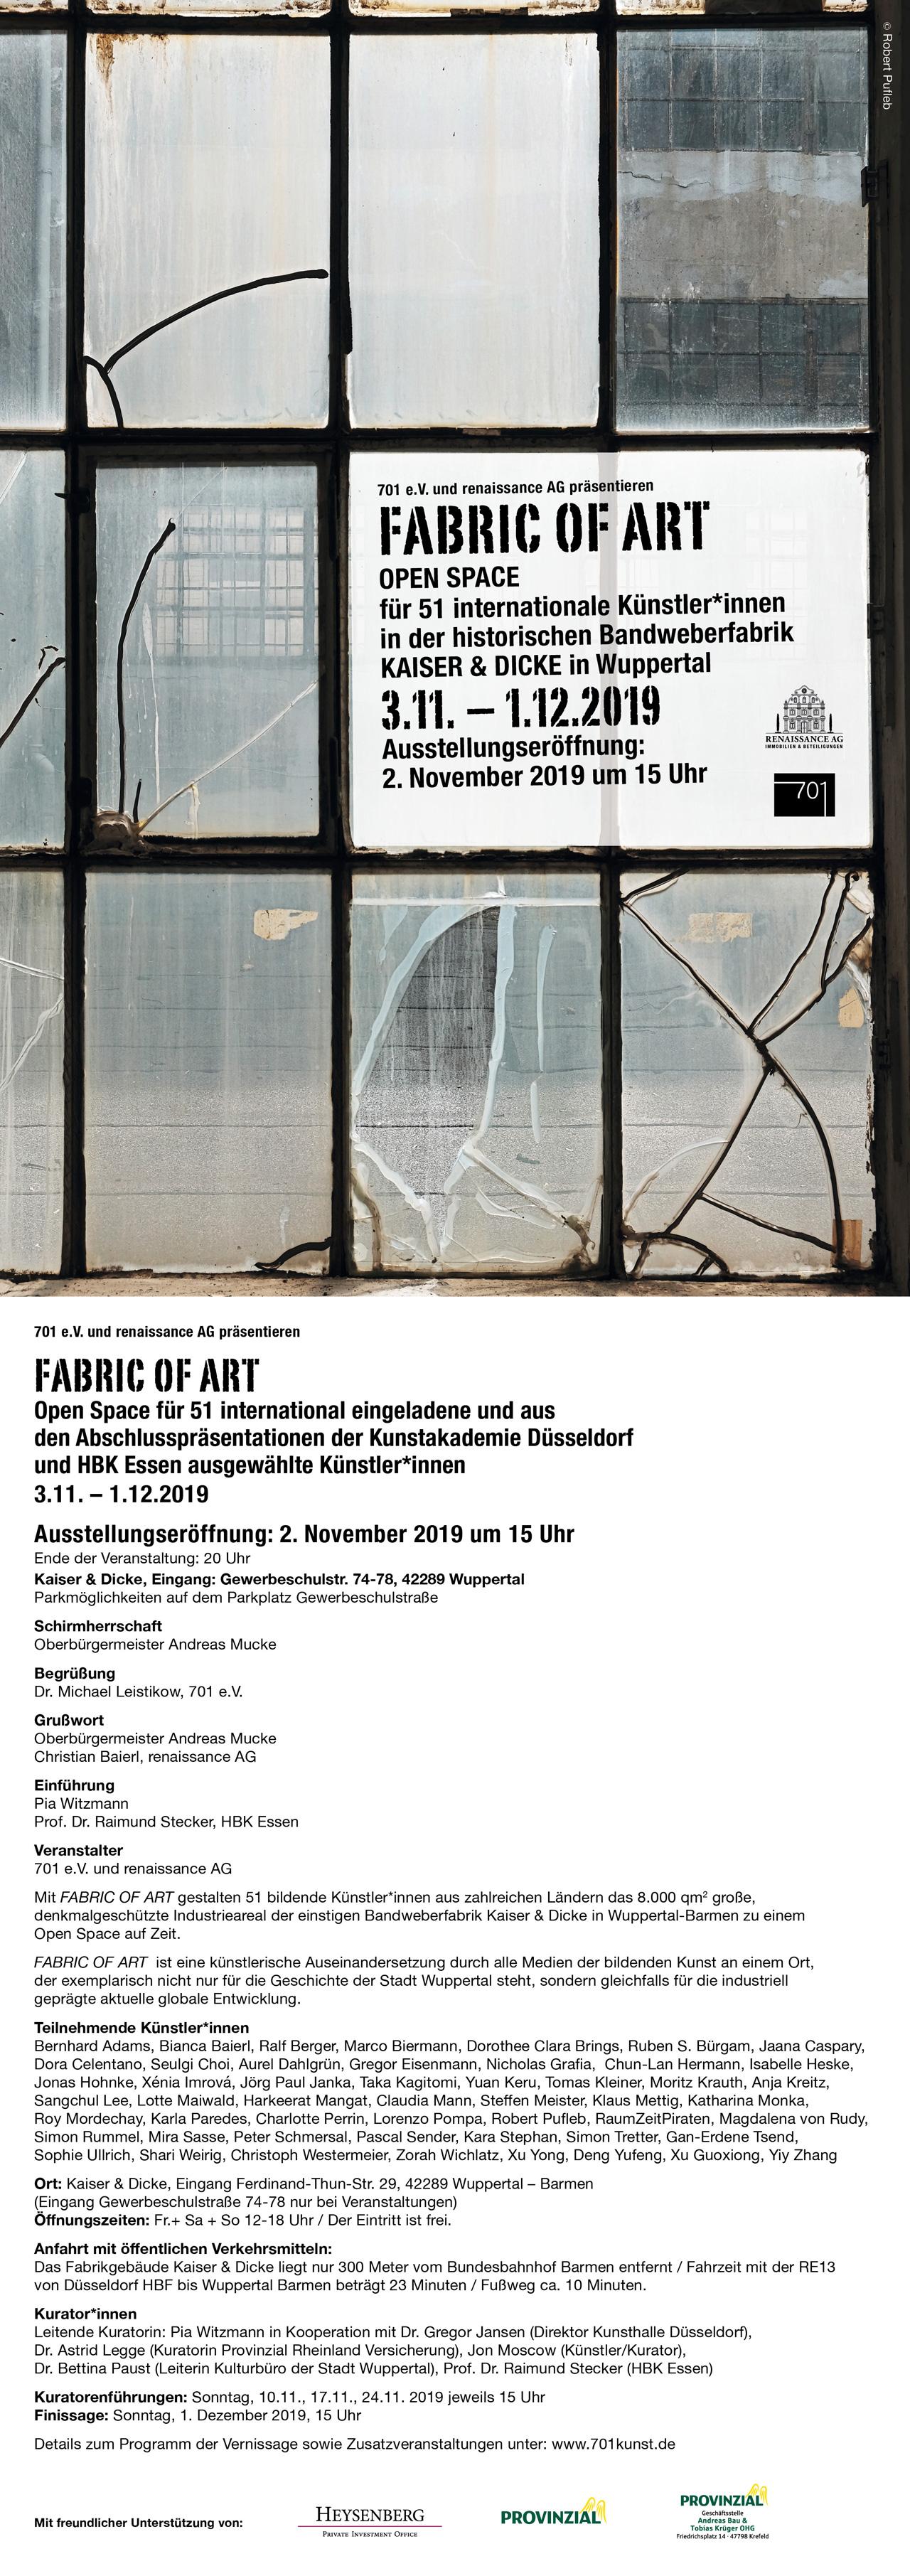 Fabric of Art - Open Space für 51 internationale Künstler*innen in historischer Wuppertaler Fabrik Kaiser & Dicke